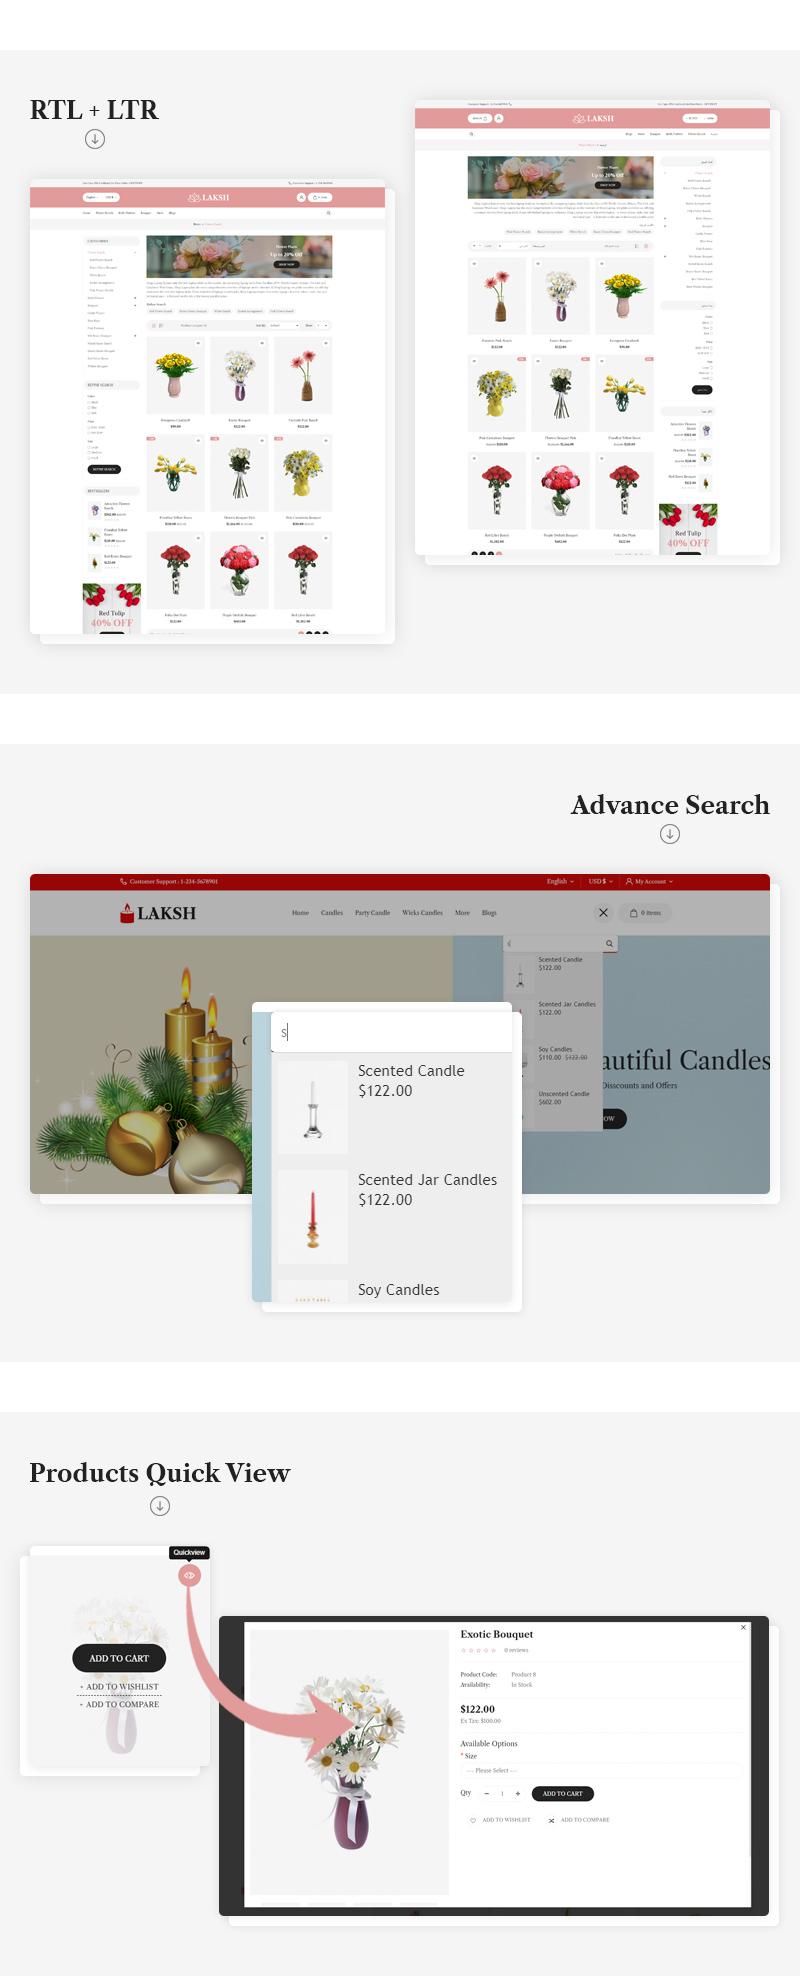 laksh-features-2.jpg